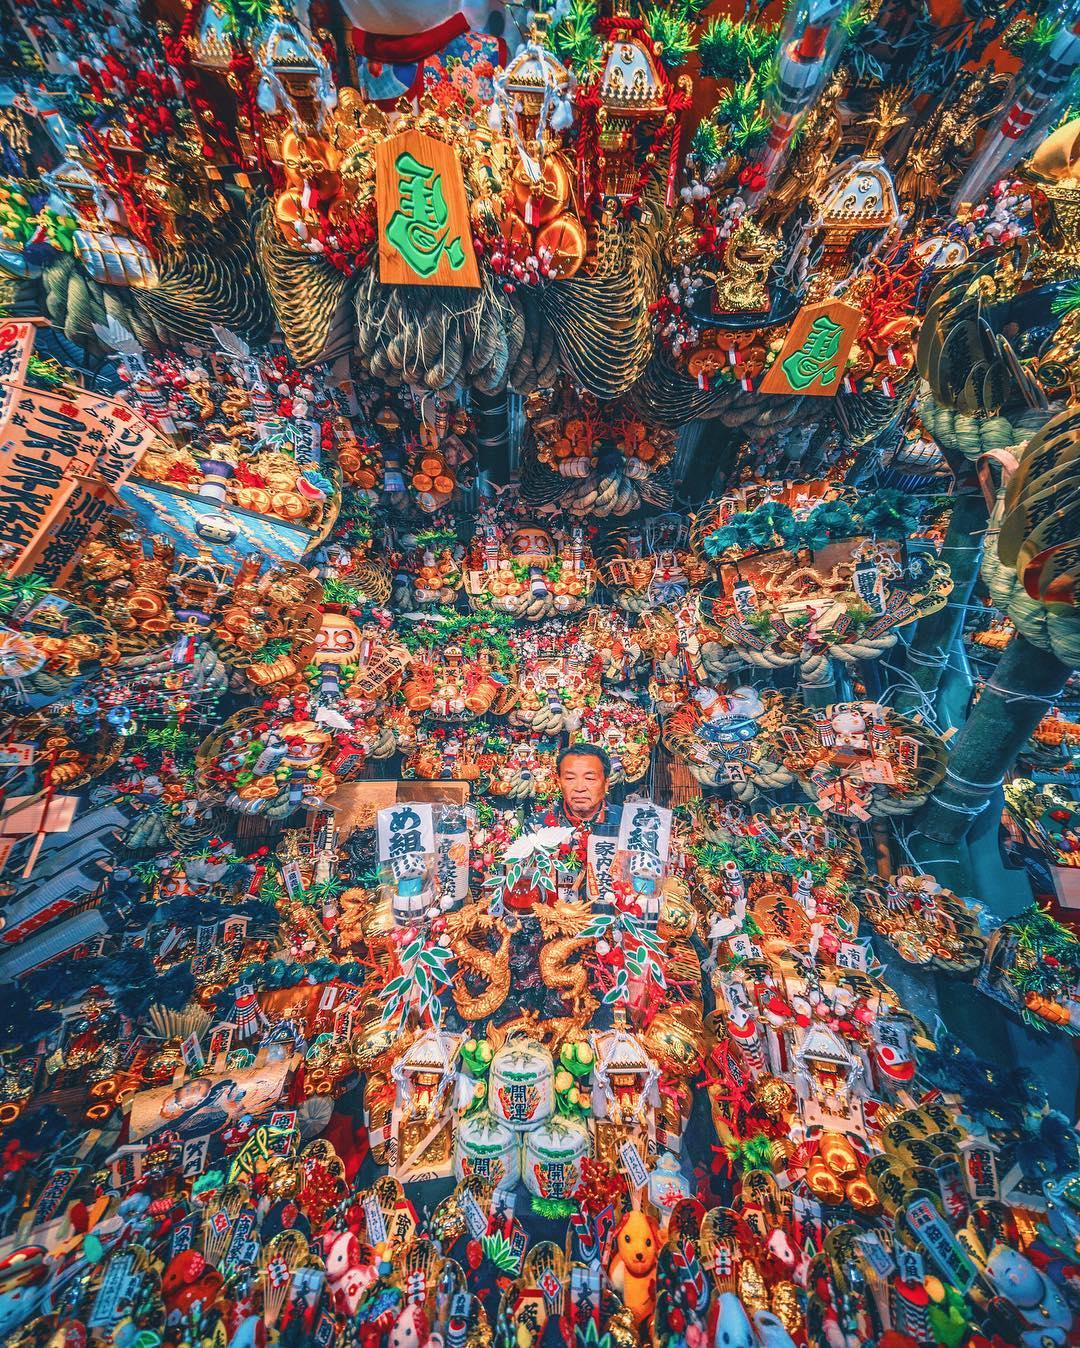 Цветовое буйство цвета в работах Наохиро Яко